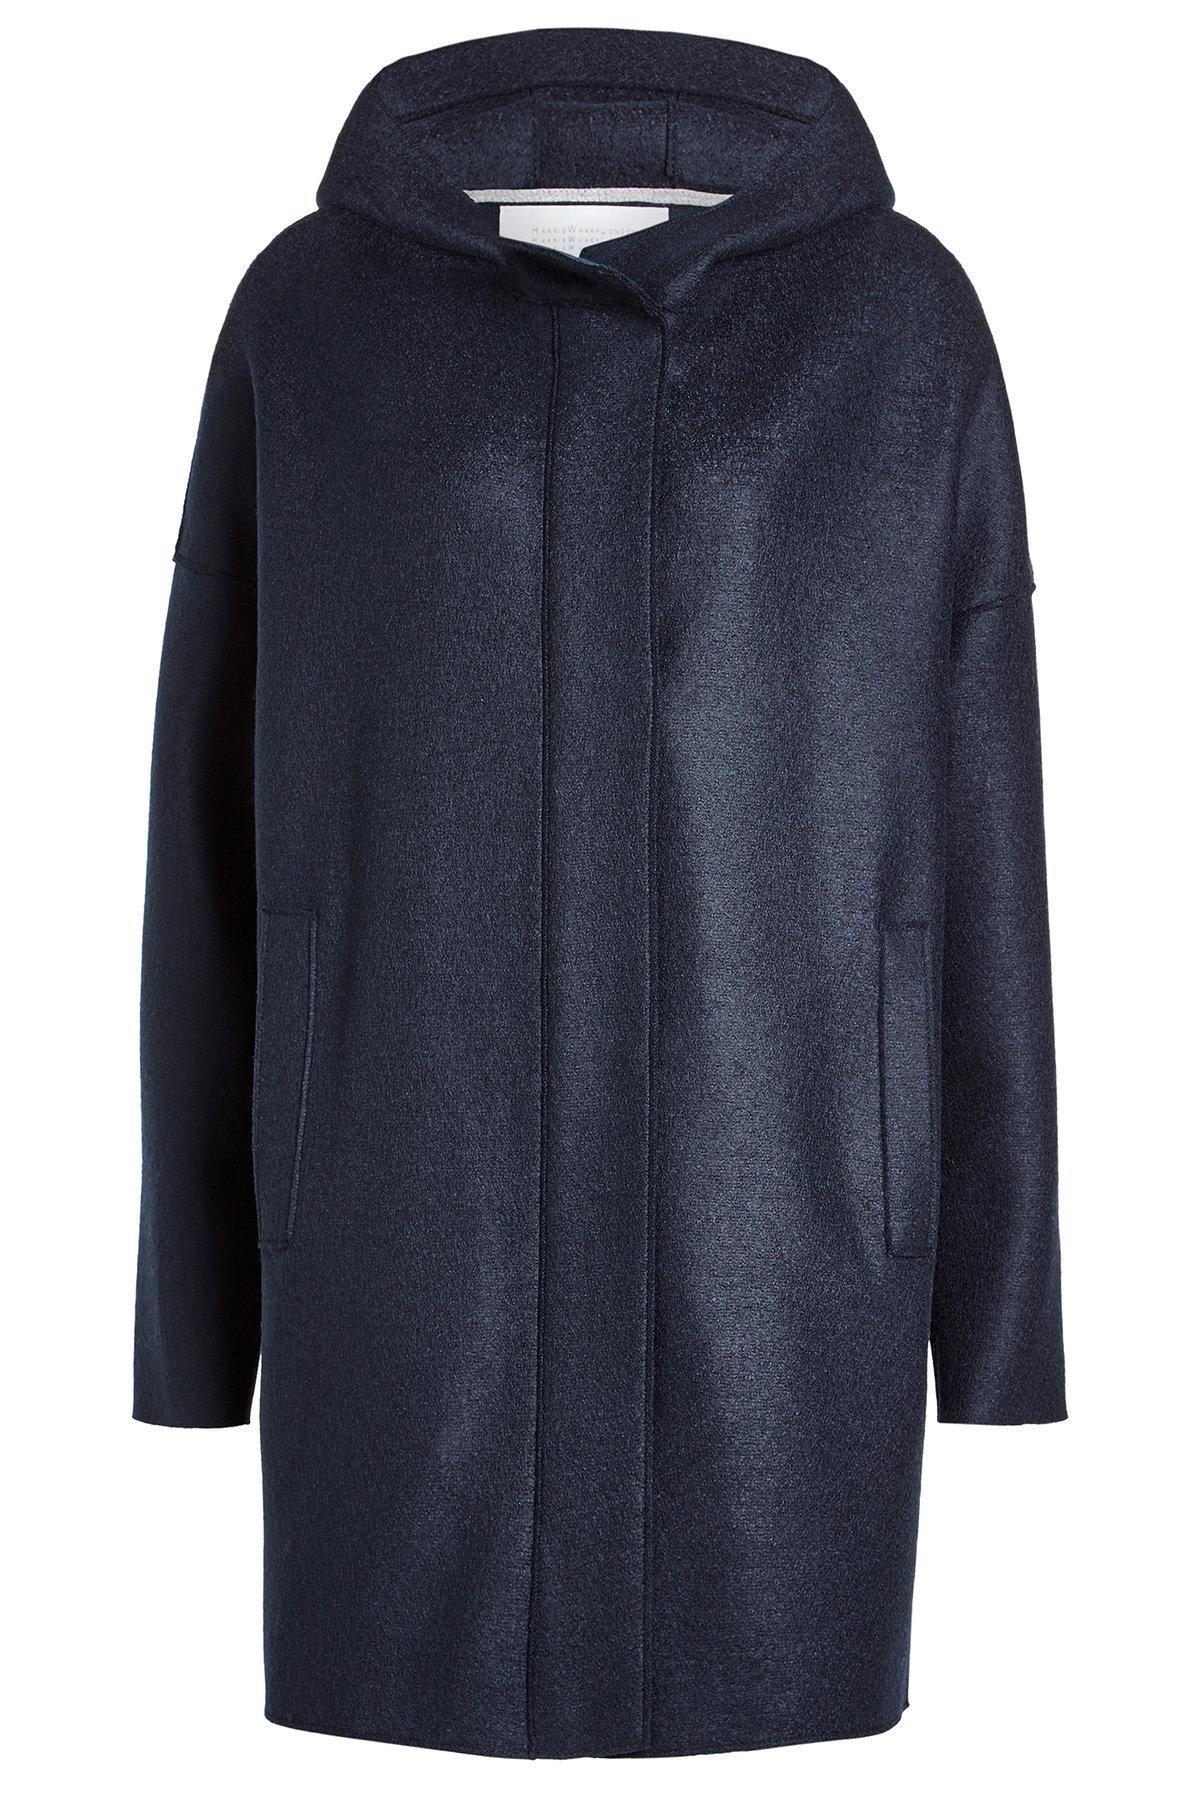 Harris Wharf London Virgin Wool Coat In Blue